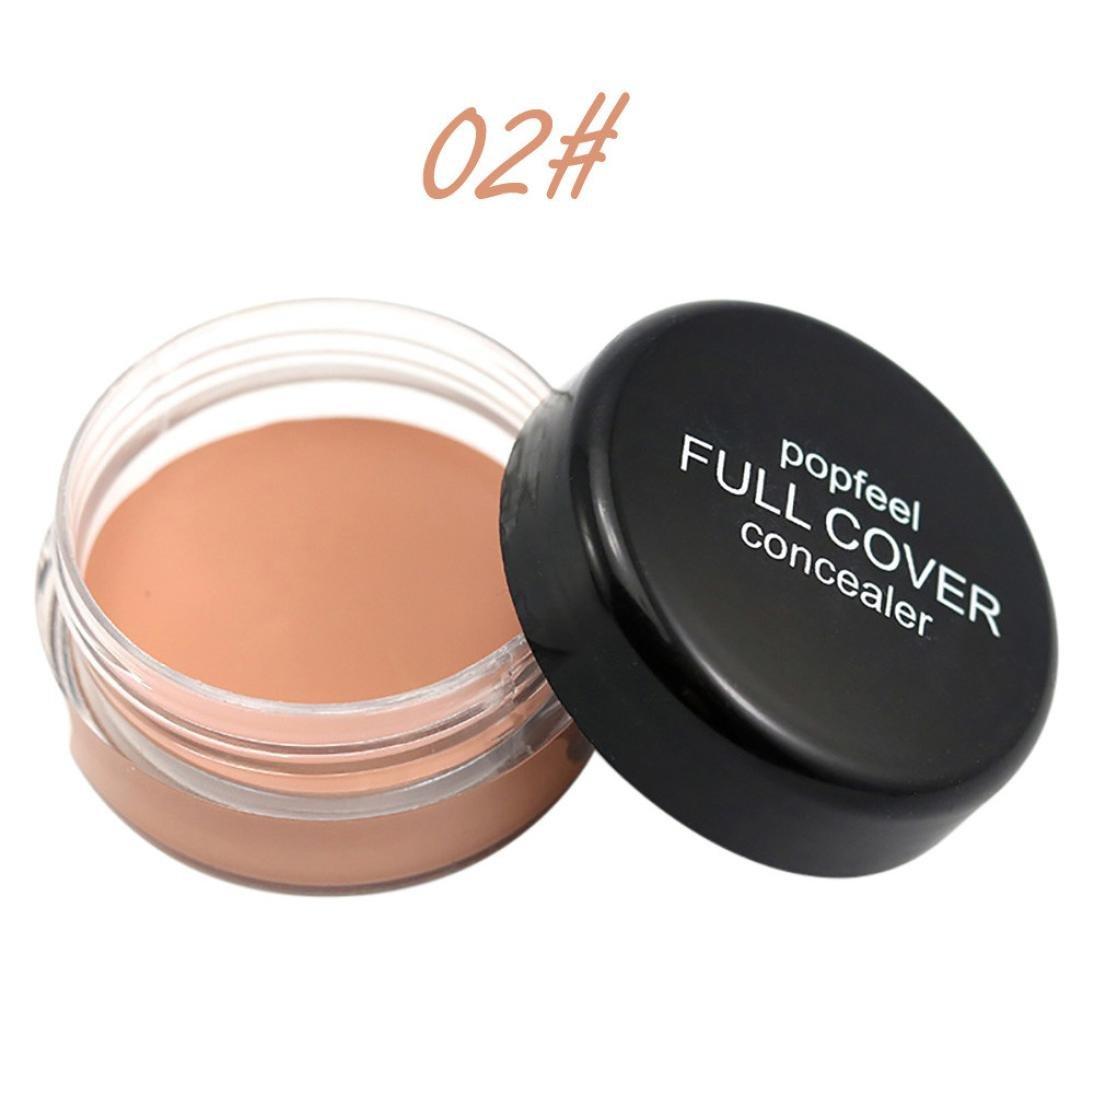 Long-lasting Waterproof Concealer XUANOU Face Makeup Concealer Foundation Palette Creamy Moisturizing Powder (02#)